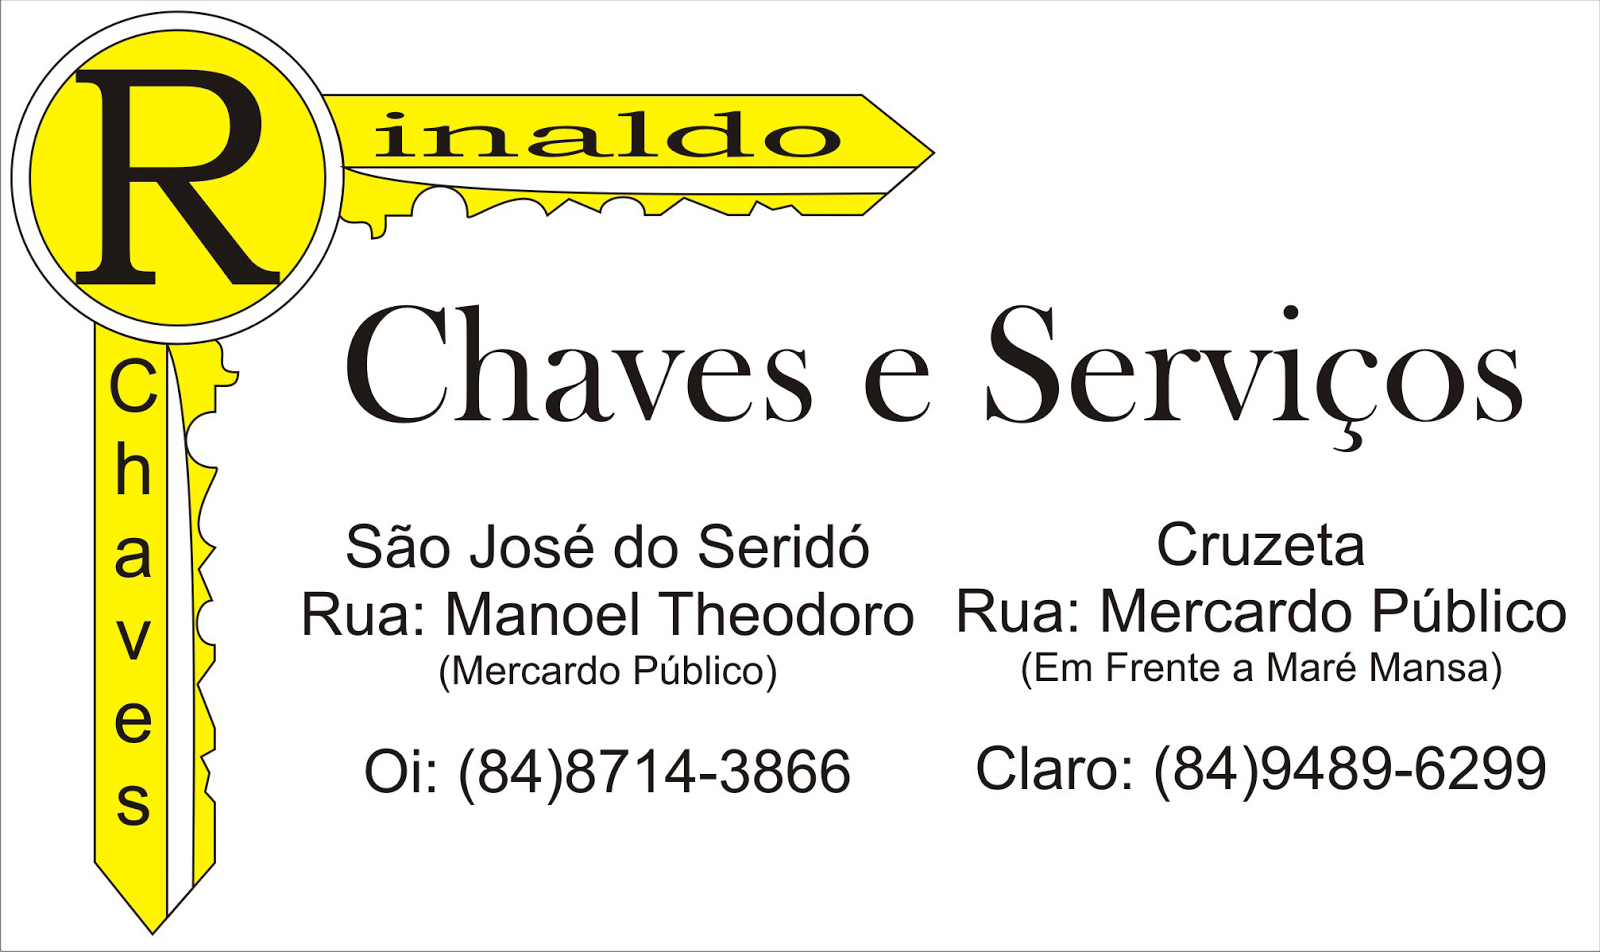 Rinaldo Chaves